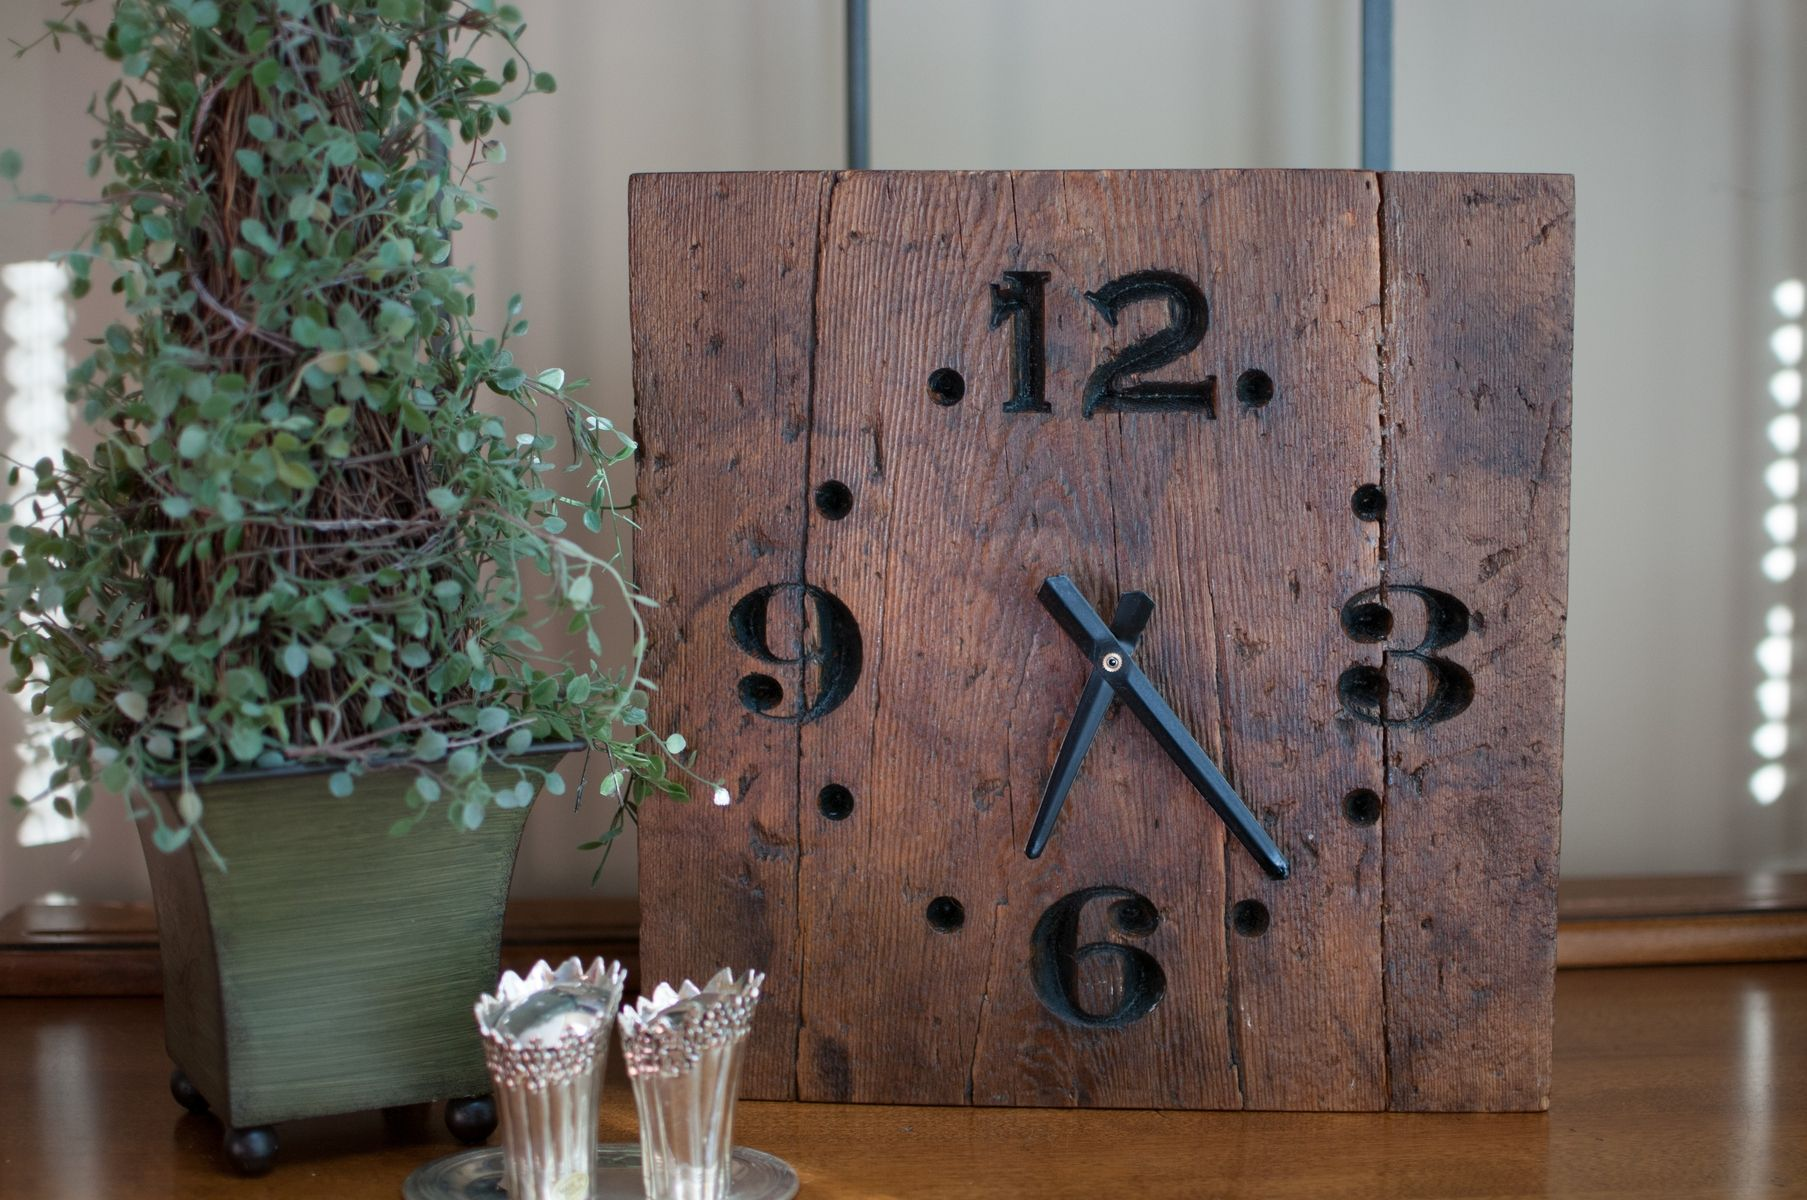 Salient Custom Made Rustic Reclaimed Wood Clock Hand Made Rustic Reclaimed Wood Clock By Green Gift Idea Wooden Wall Clocks Wooden Desk Clocks furniture Unique Wooden Clocks